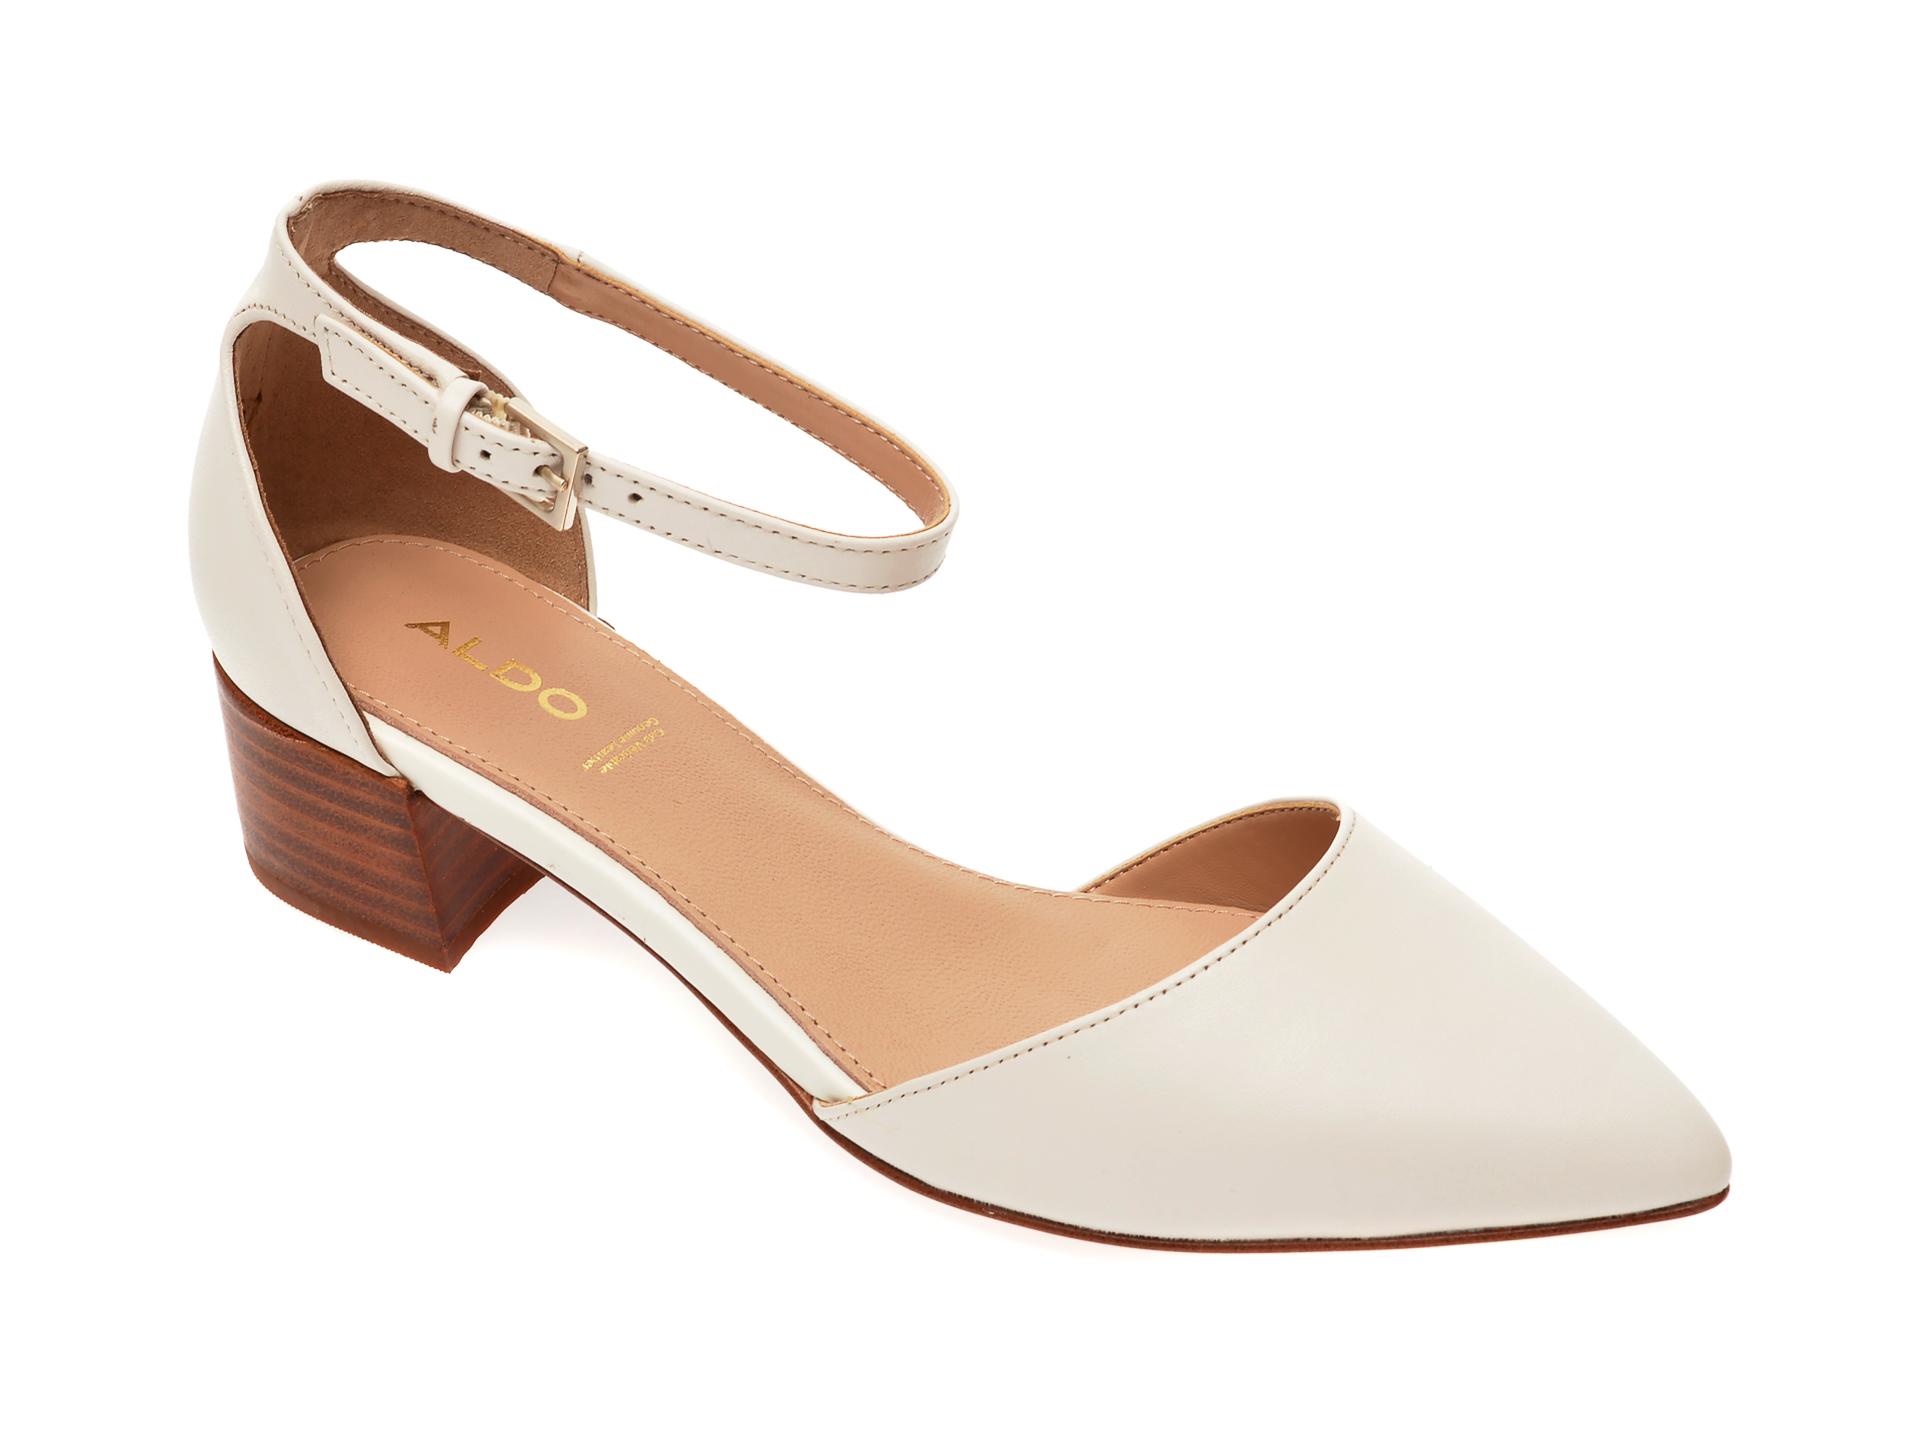 Pantofi ALDO albi, Zuliand102, din piele naturala